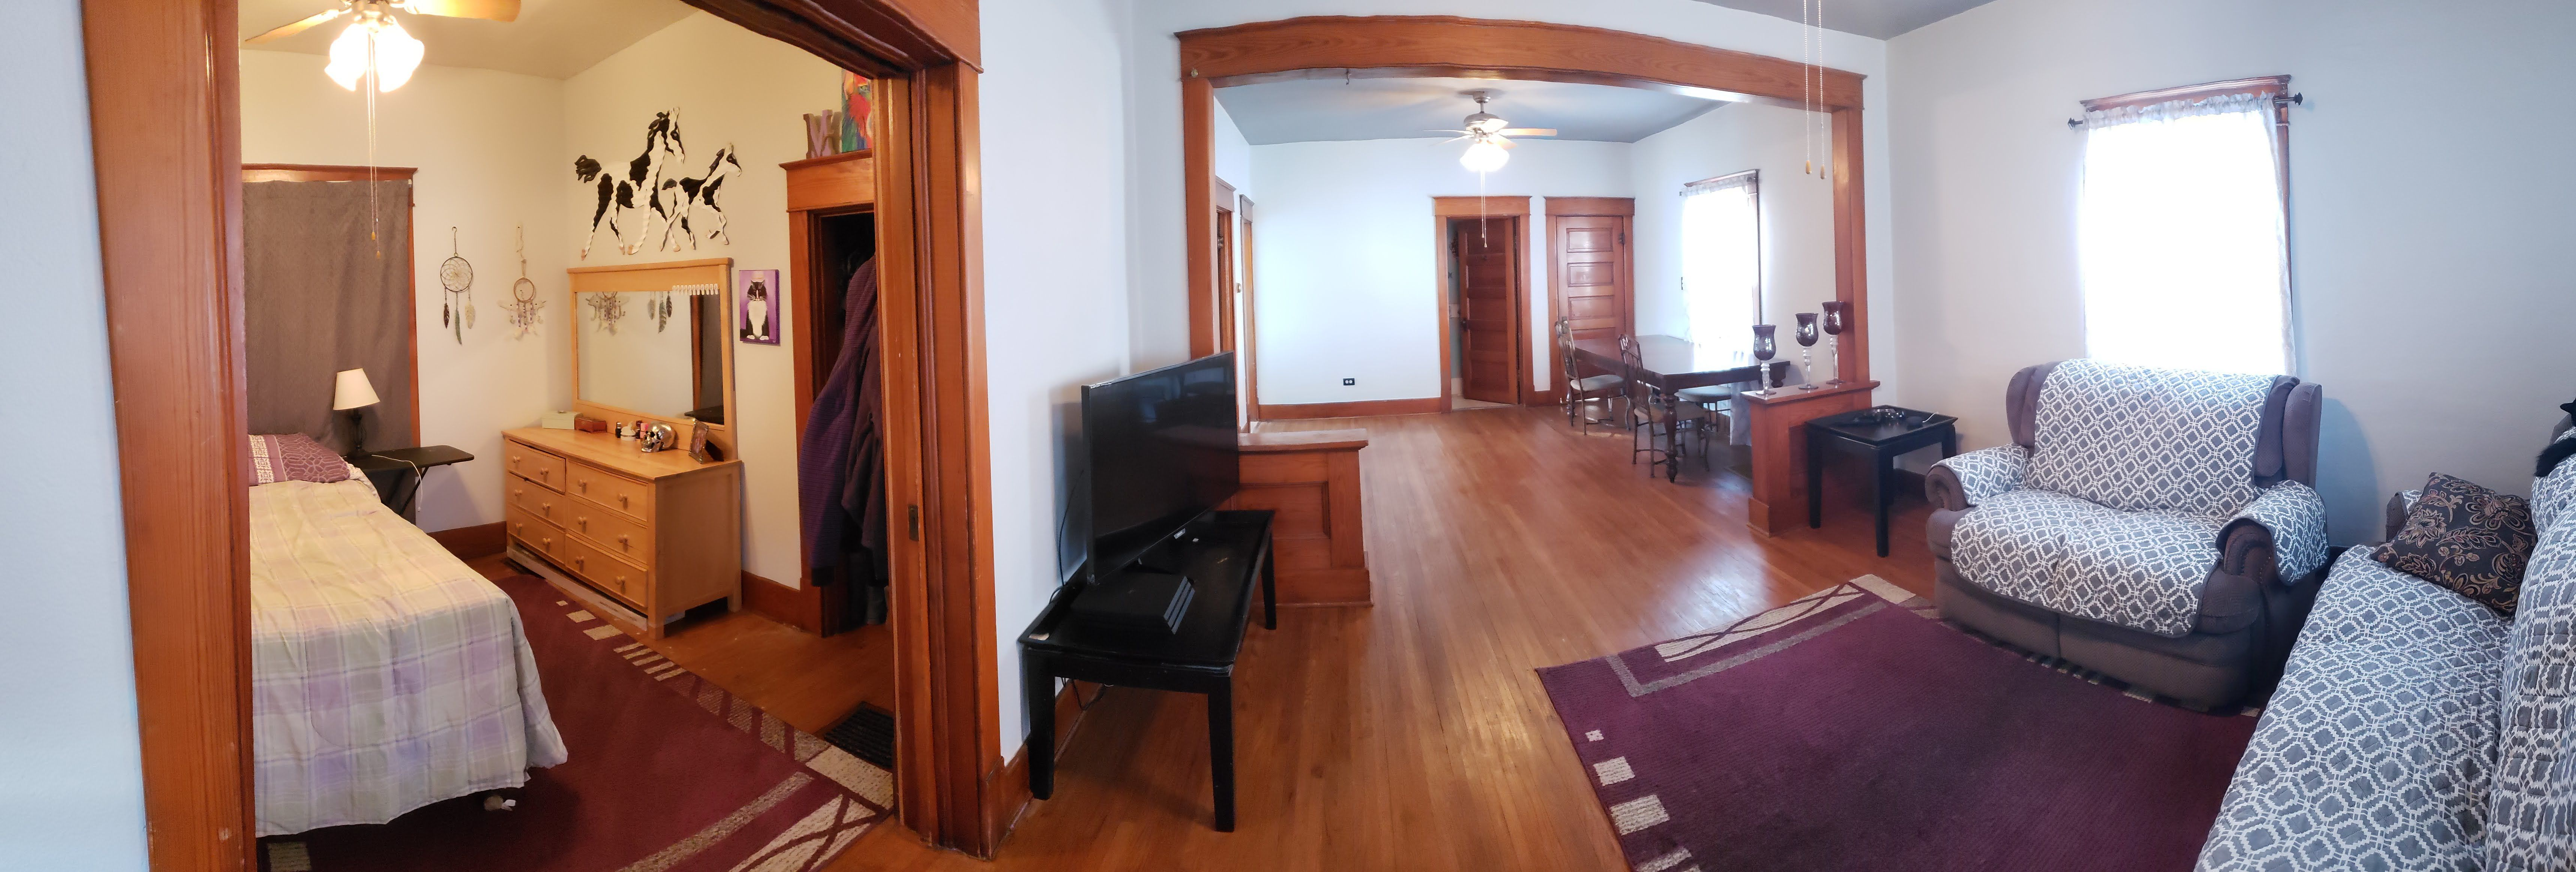 Home For Sale Clarinda, IA image 1